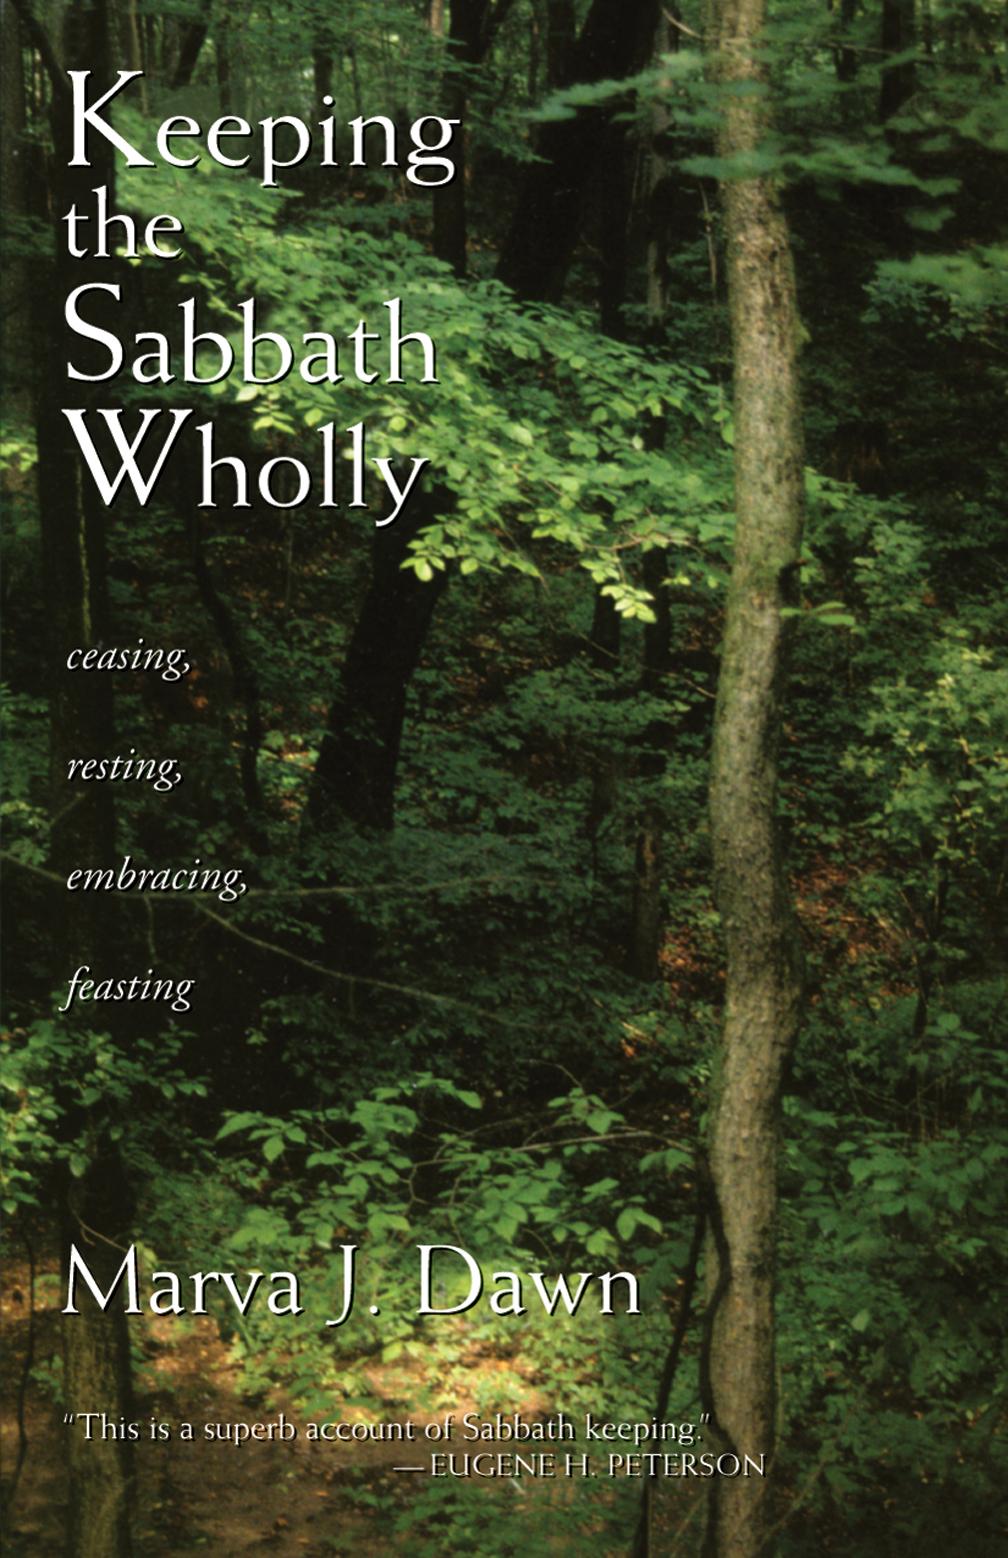 Keeping the Sabbath Wholly